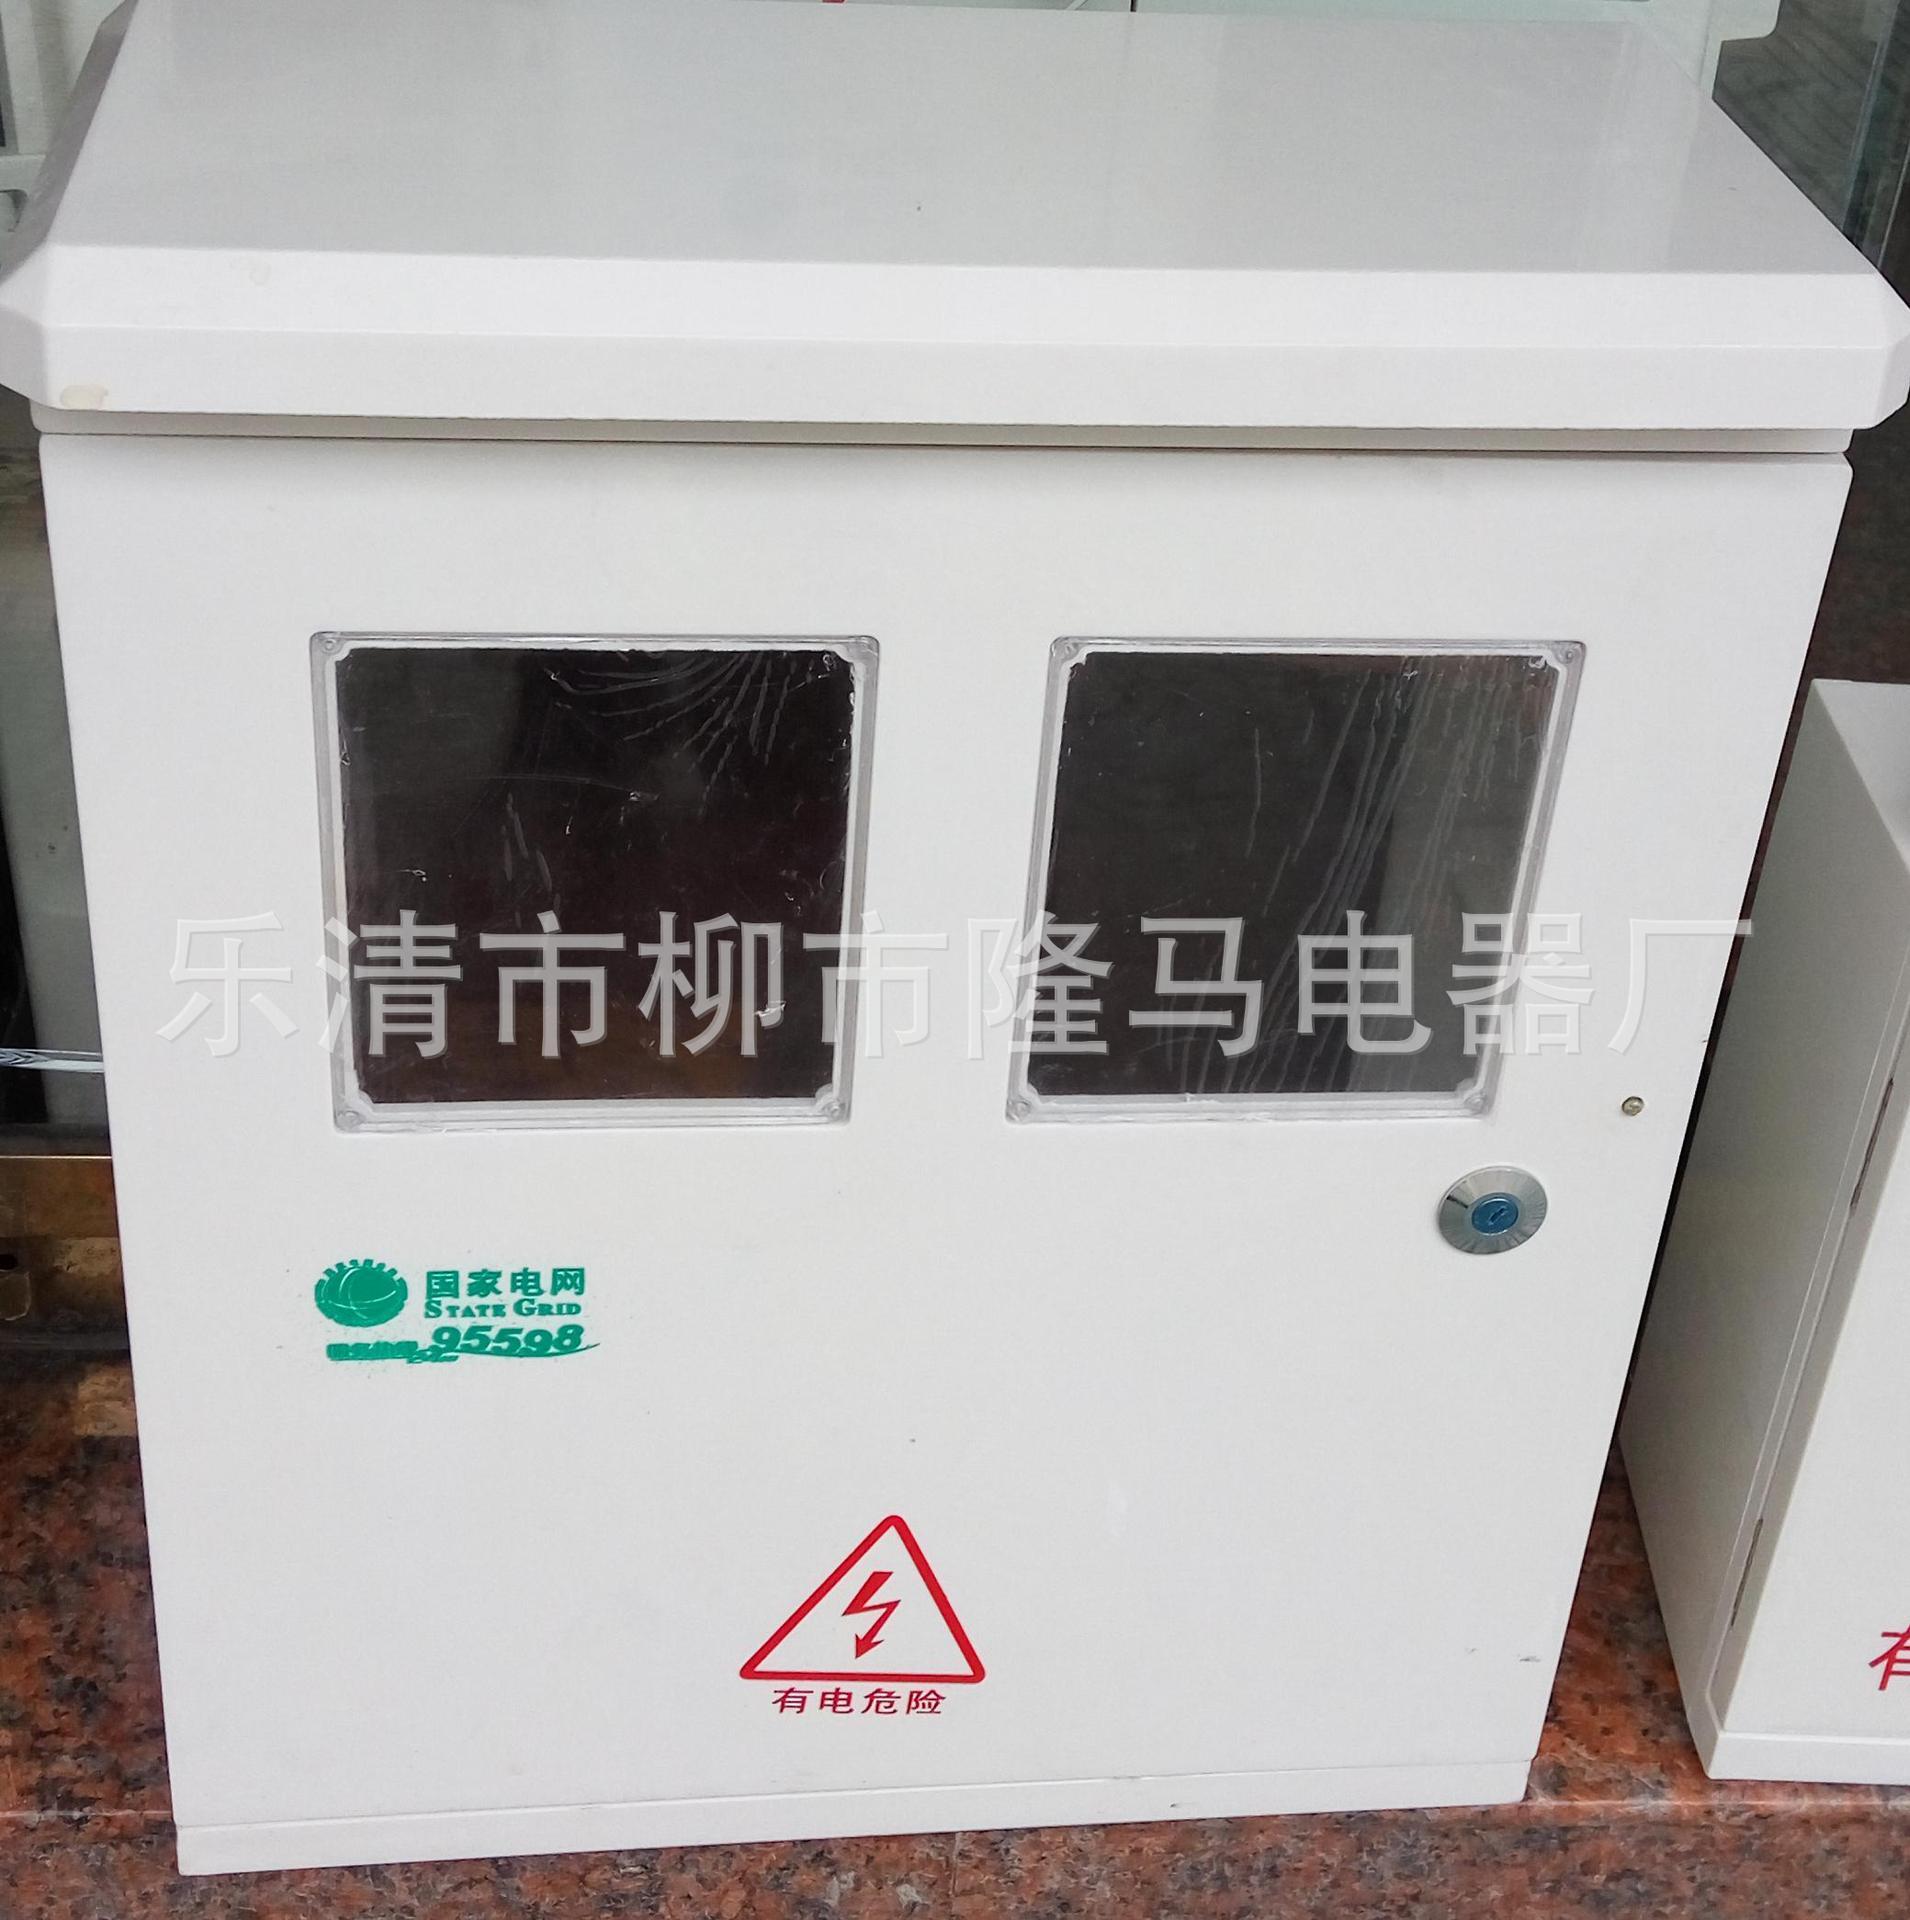 Bộ thiết bị điện cao áp  Longma Electric 10kv unsaturated resin environmental design windowed wall-